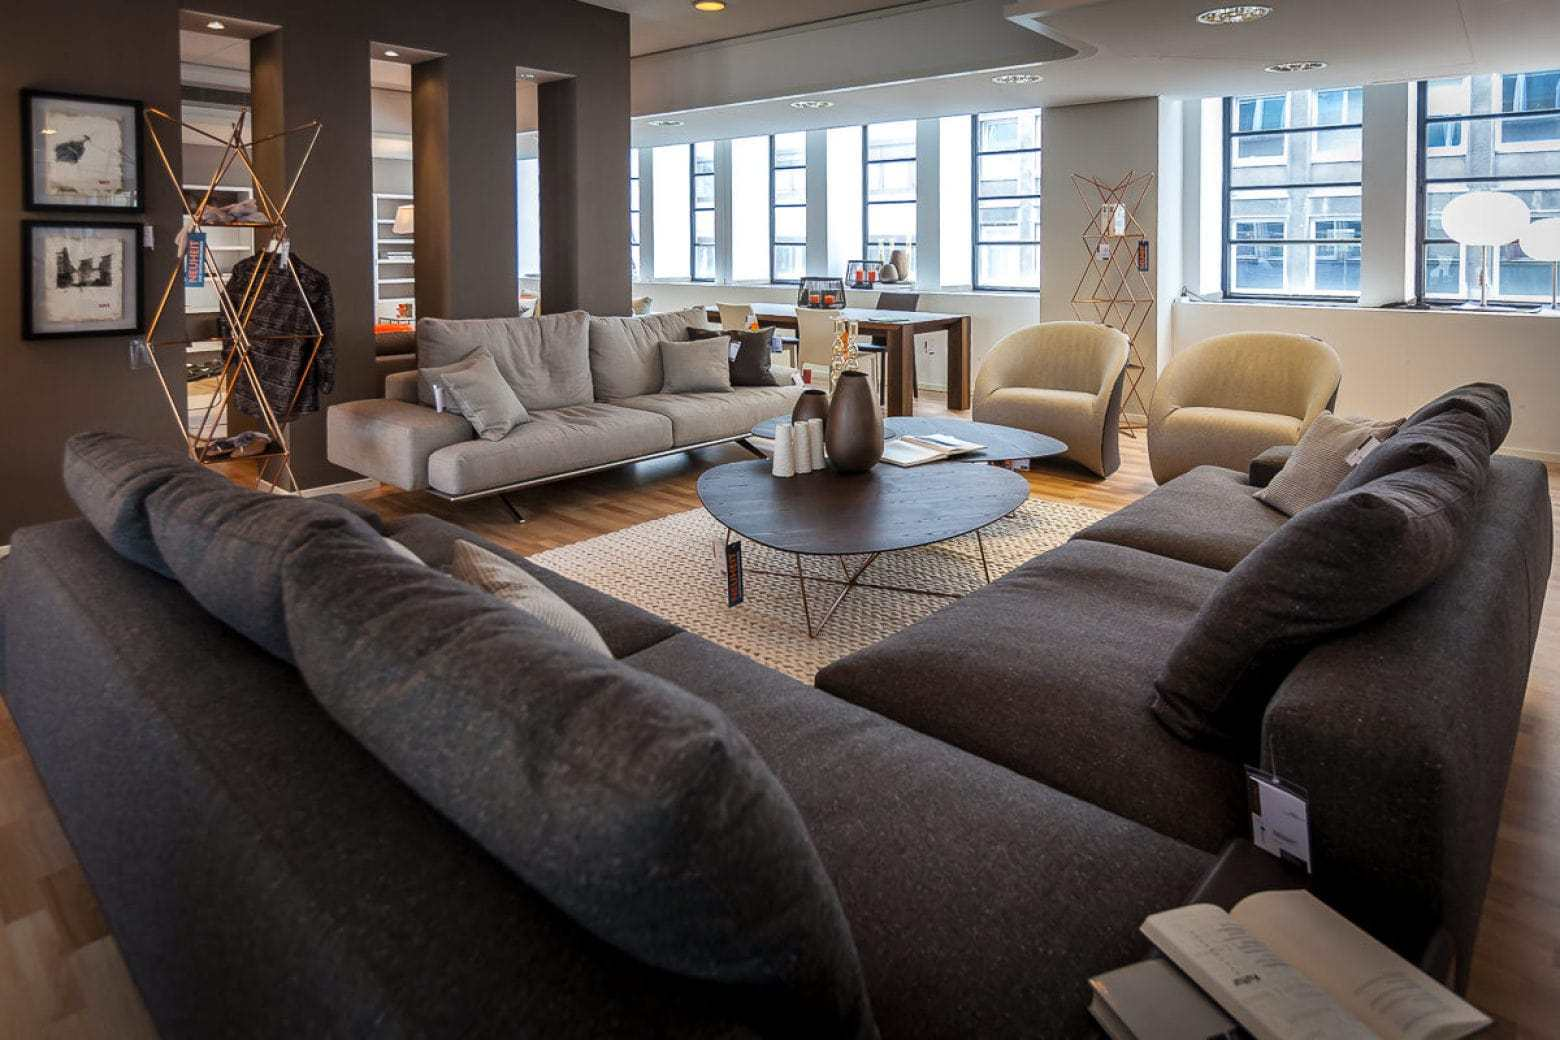 m belhaus d sseldorf who 39 s perfect. Black Bedroom Furniture Sets. Home Design Ideas